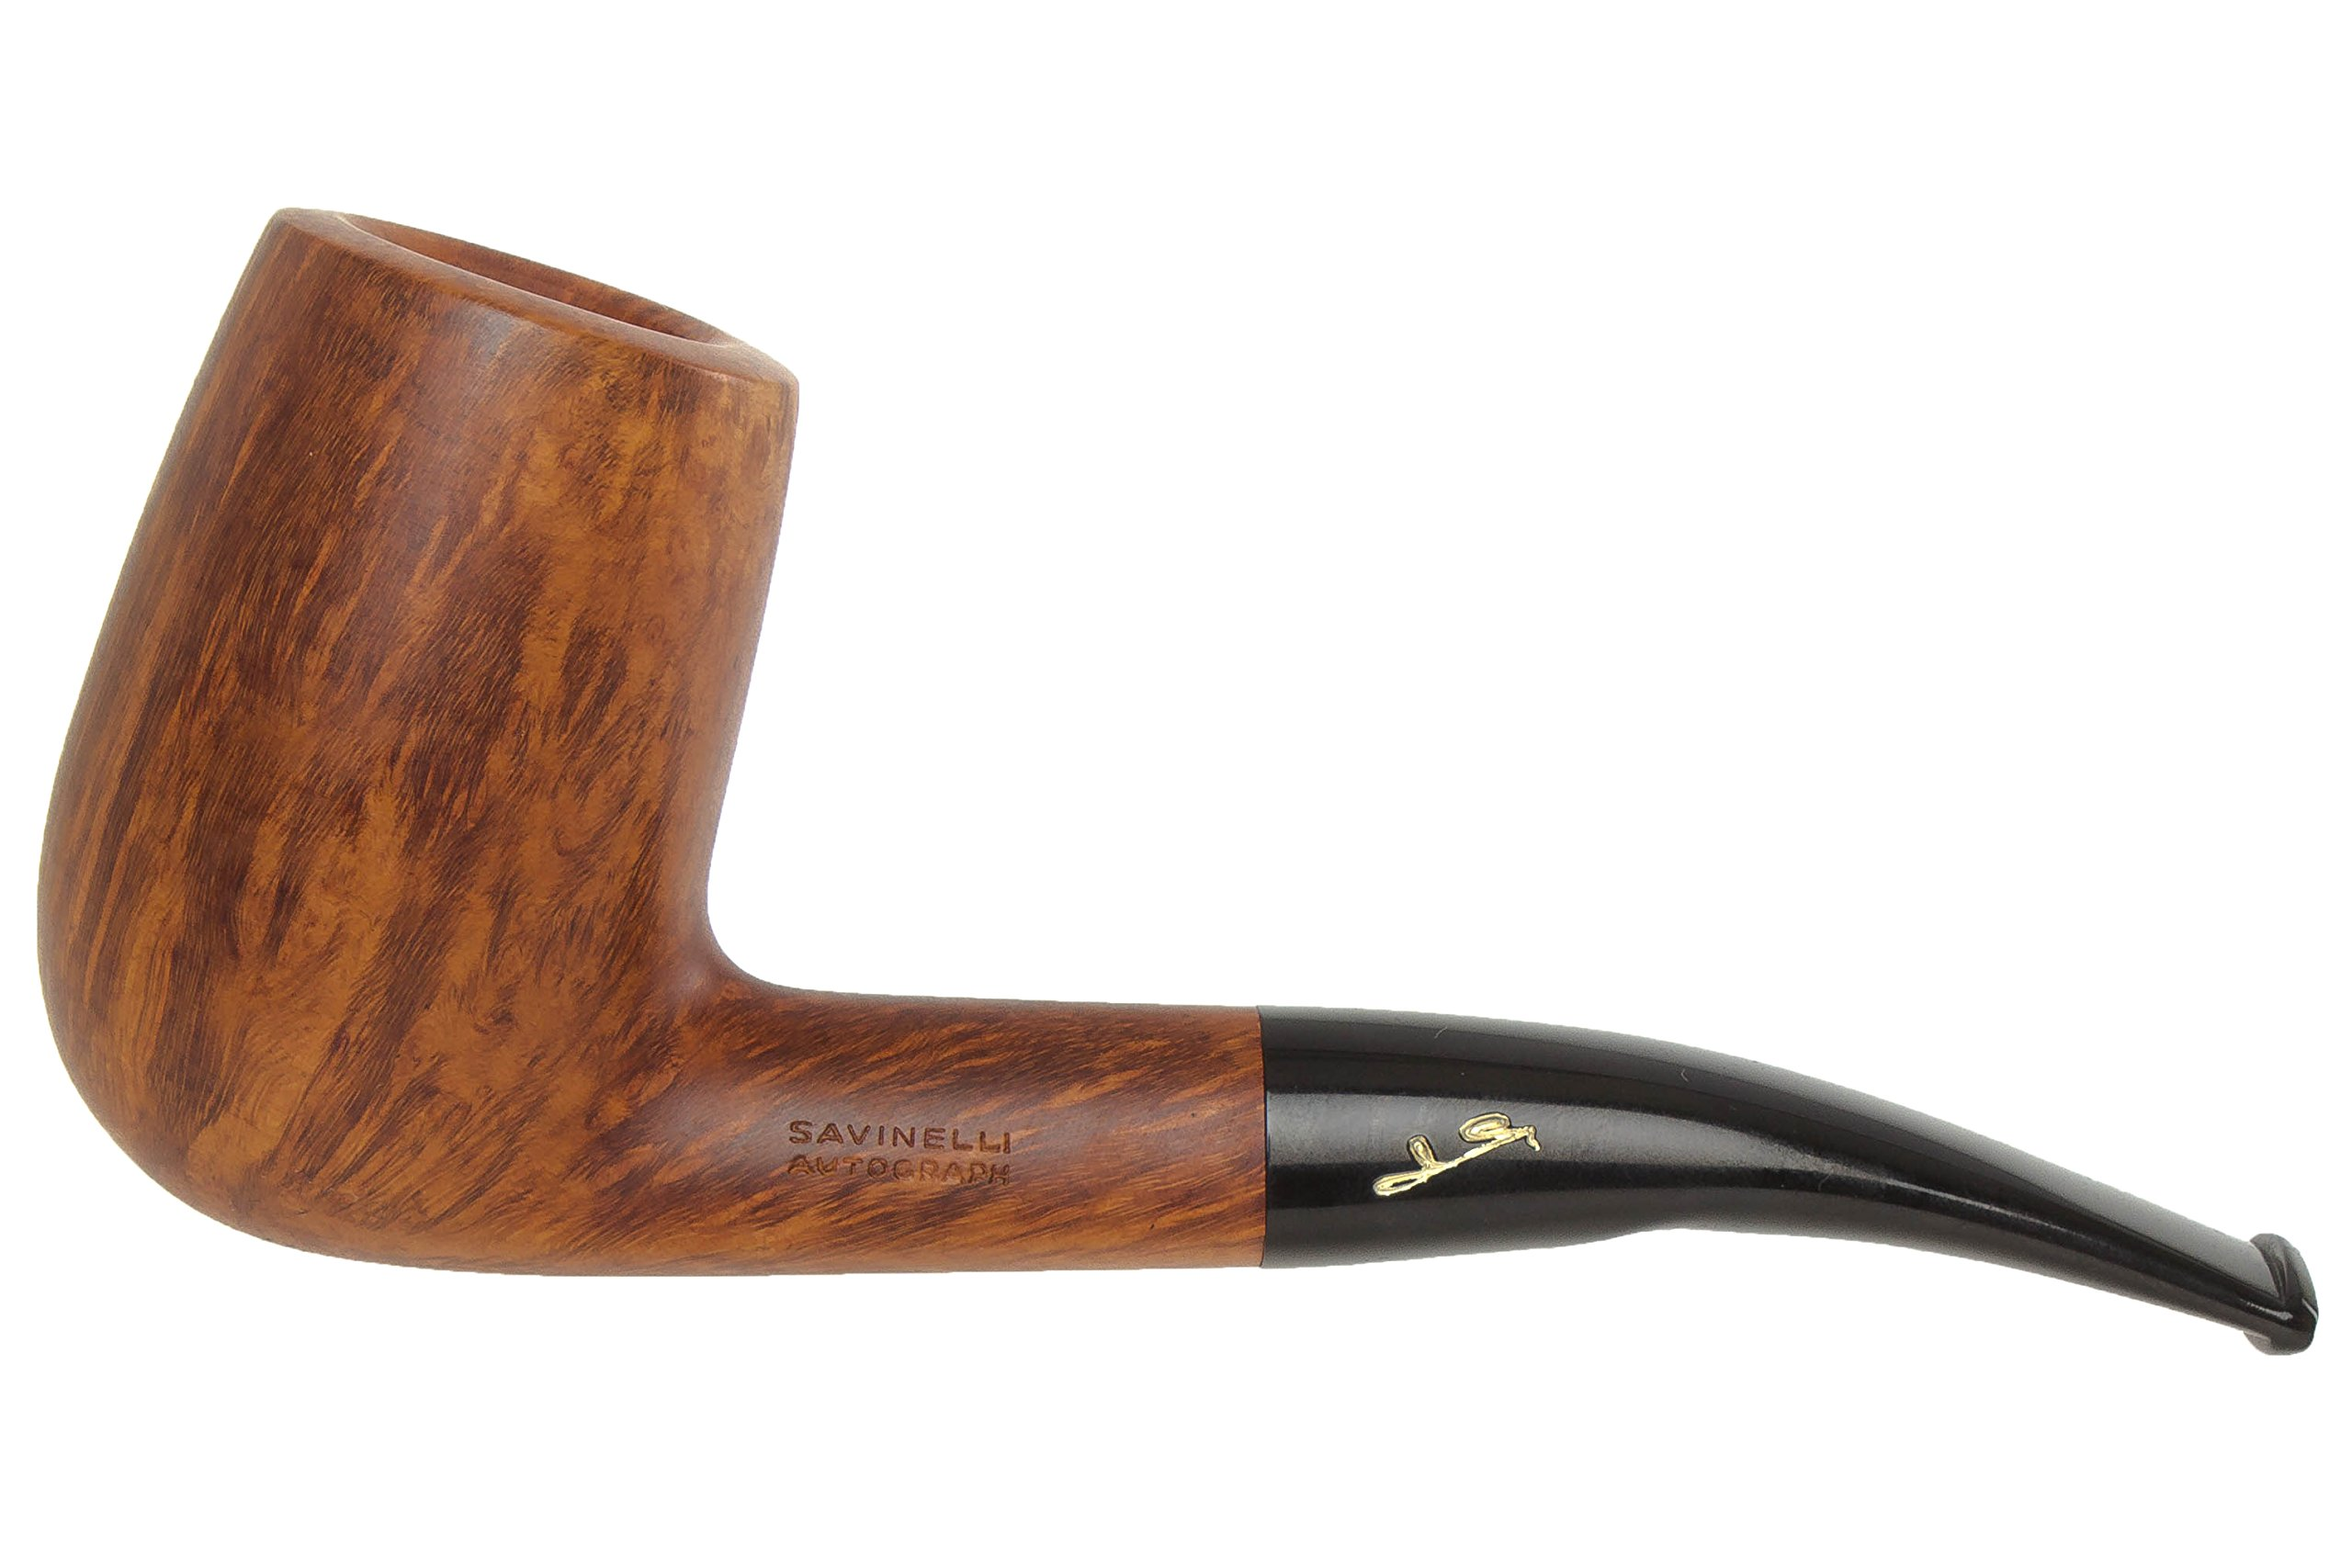 Savinelli Autograph Smooth 5 Tobacco Pipe - TP4122 by Savinelli (Image #1)